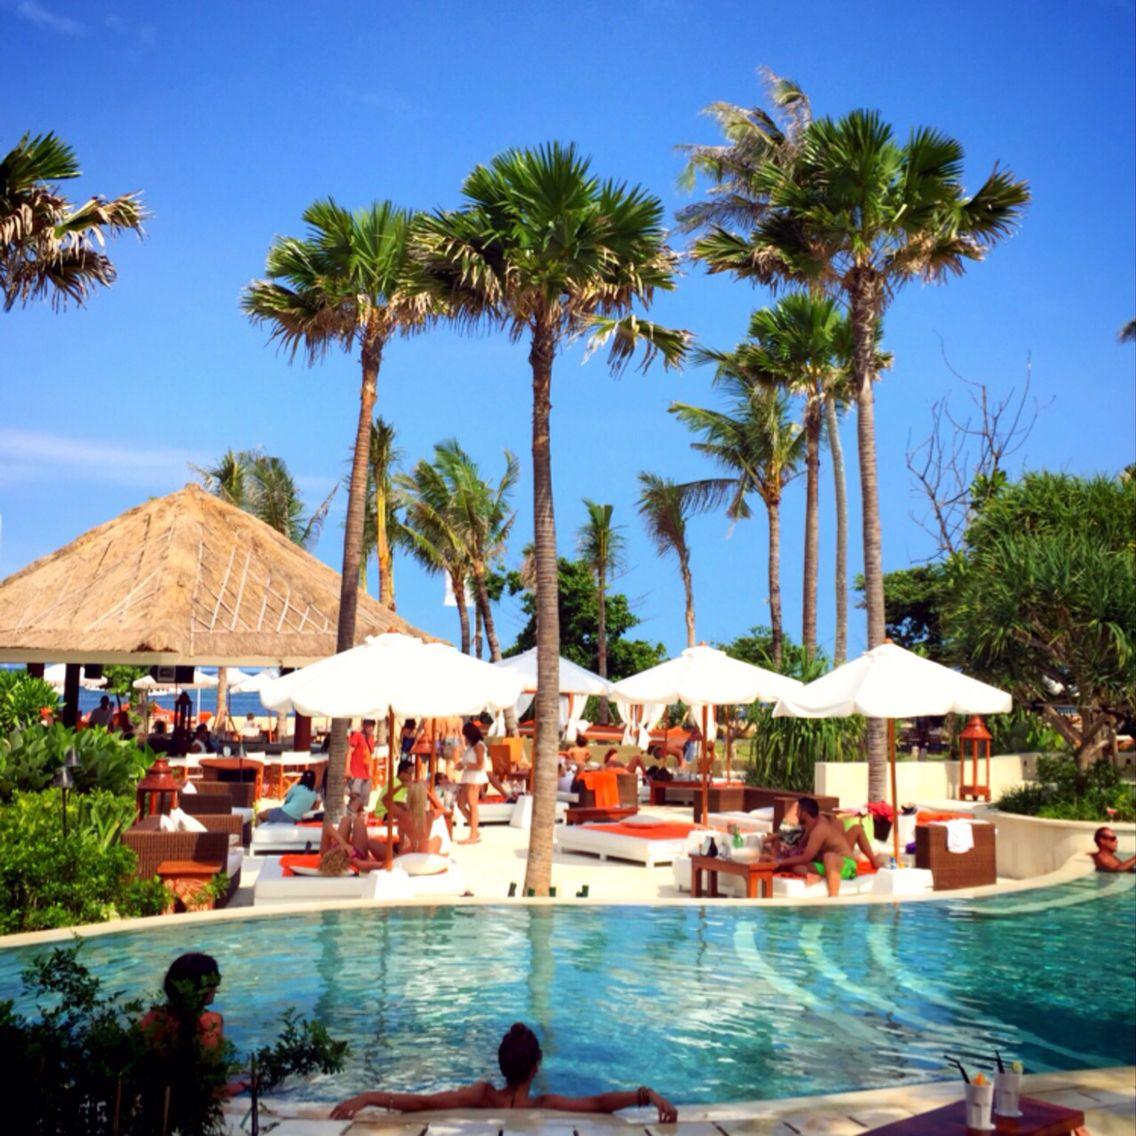 Happy time at Nikki Beach Club Bali Indonesia